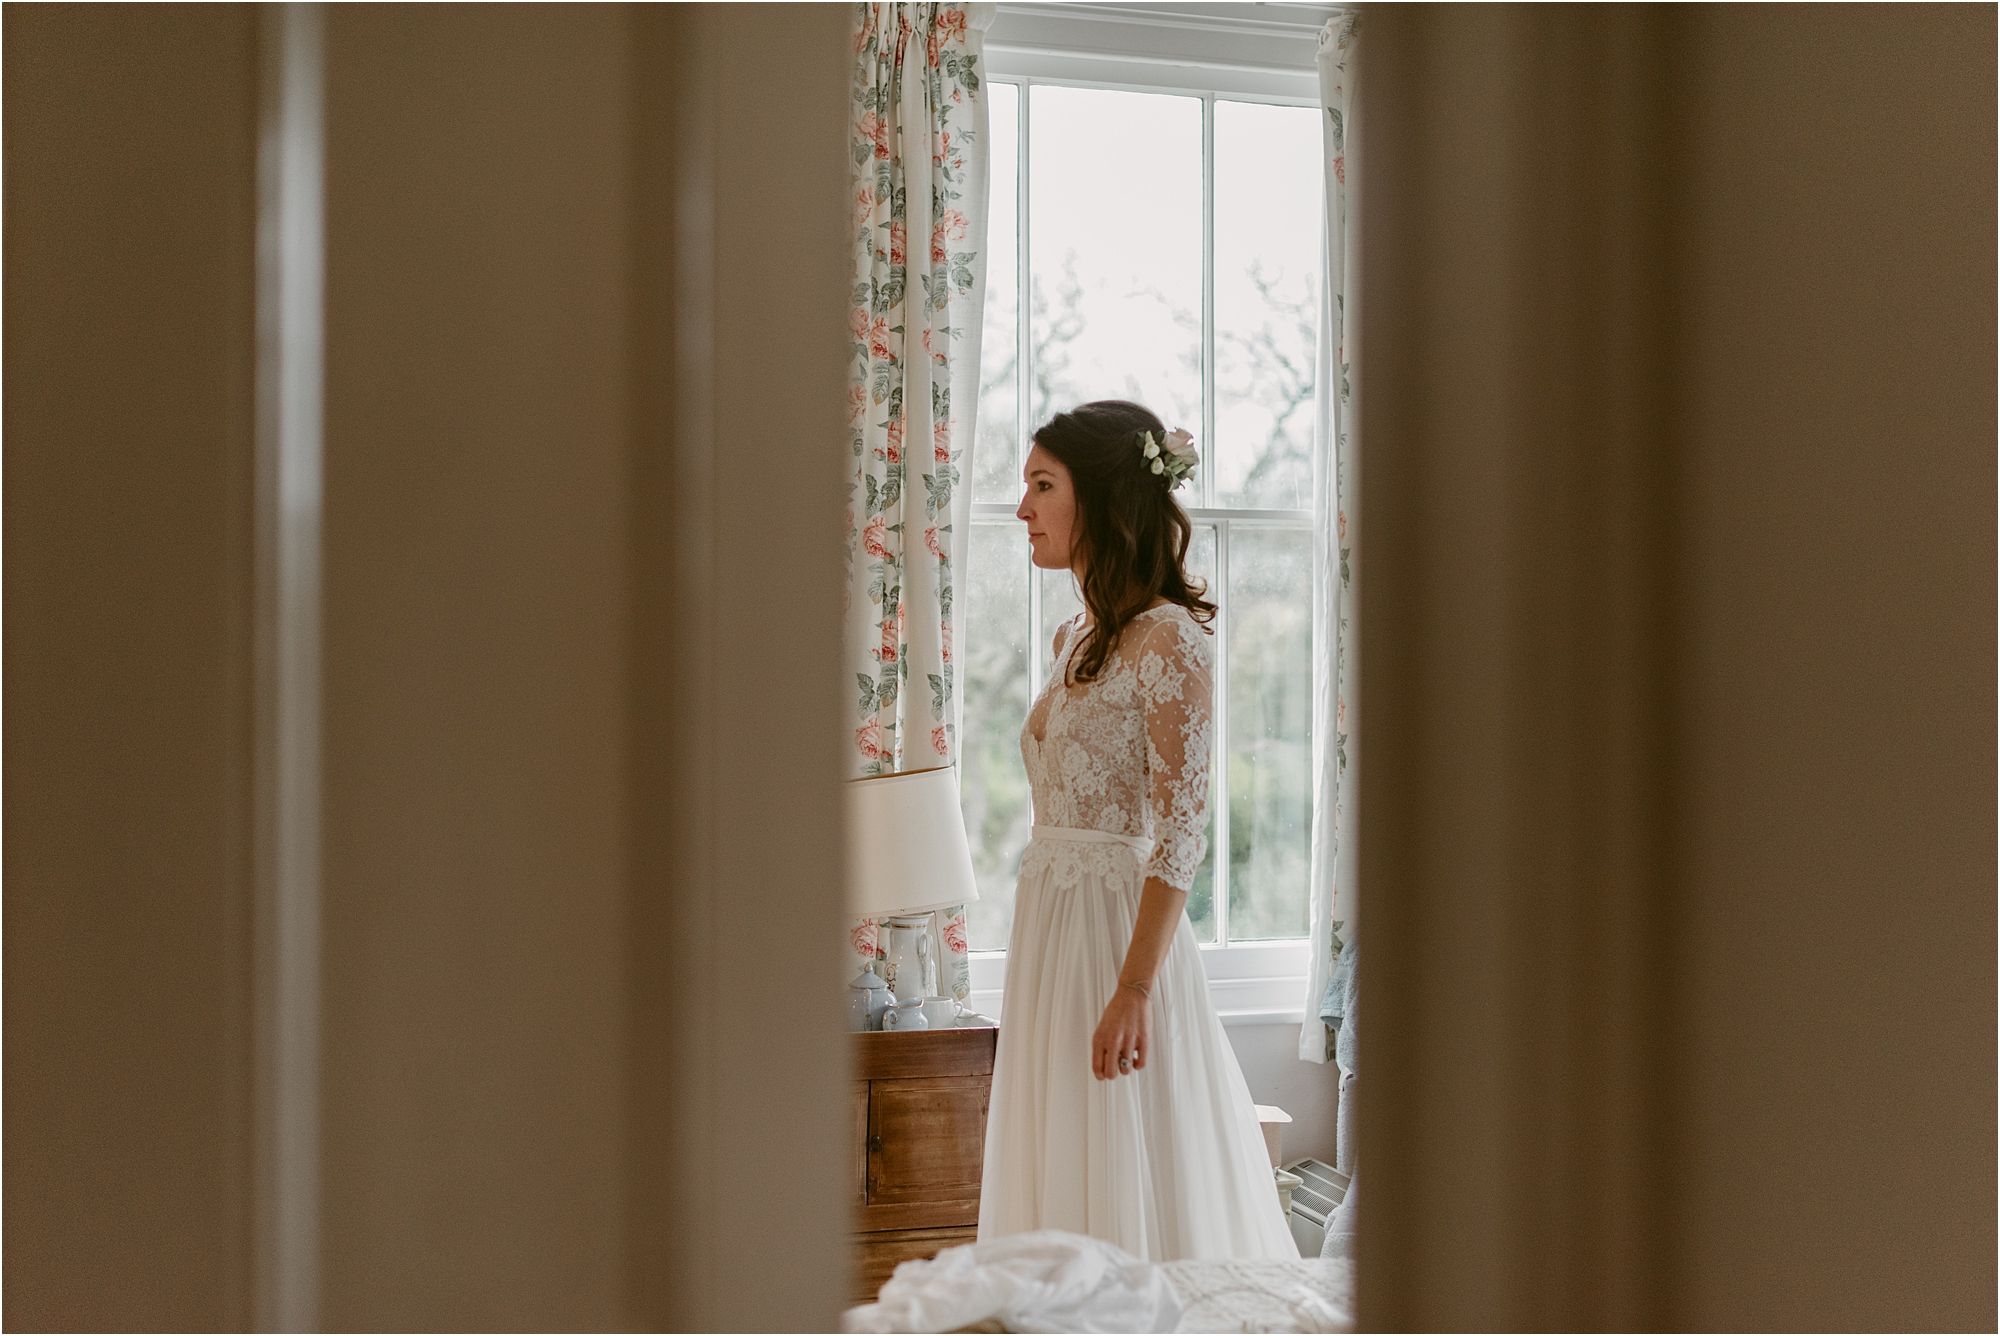 Rose+Harry-outdoor-english-wedding-photography__0038.jpg